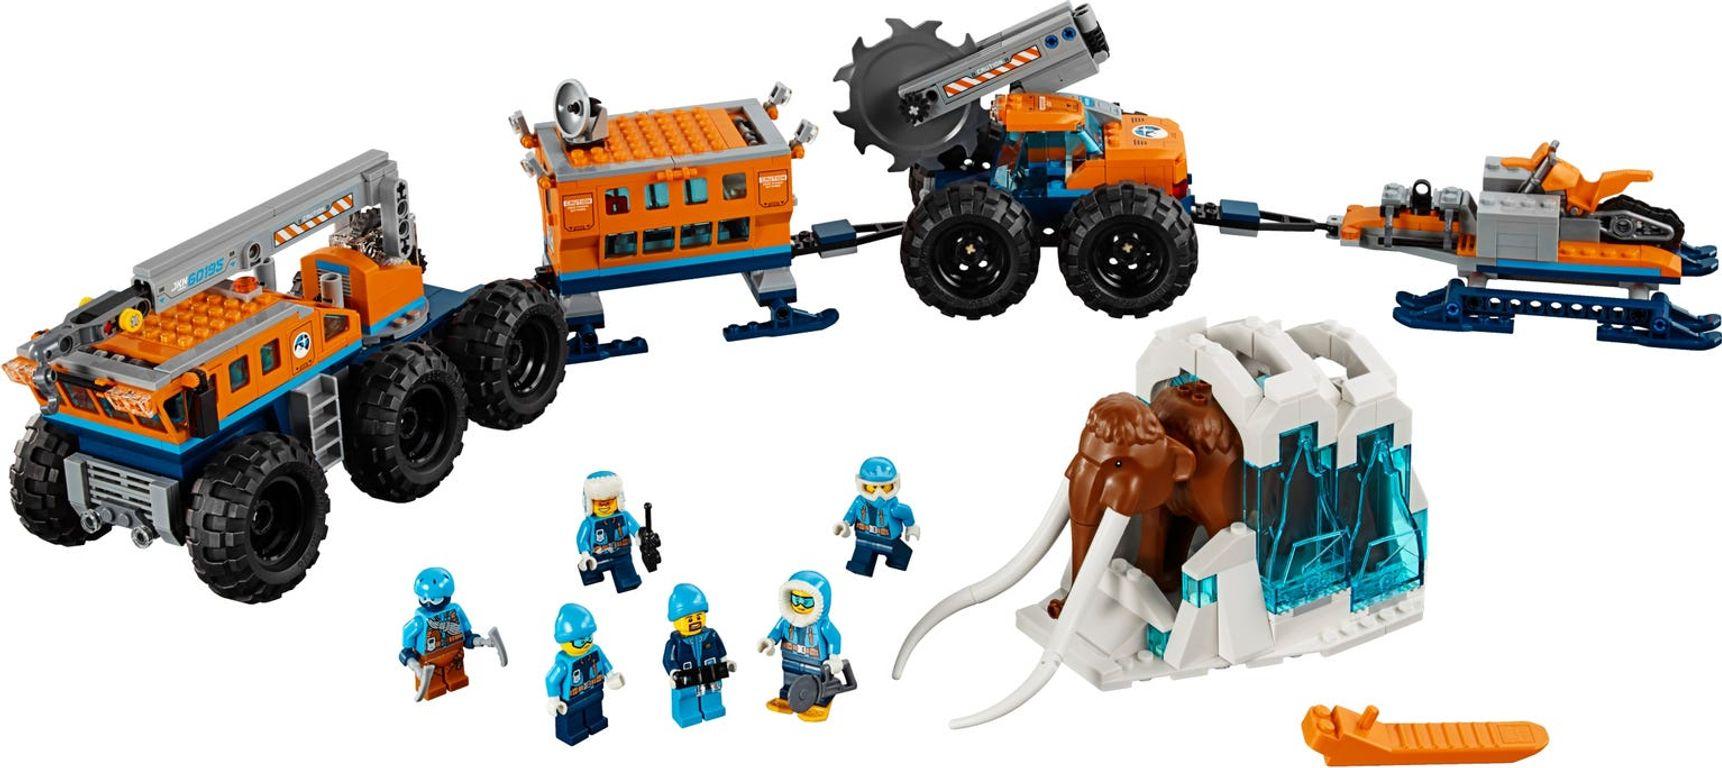 LEGO® City Arctic Mobile Exploration Base components